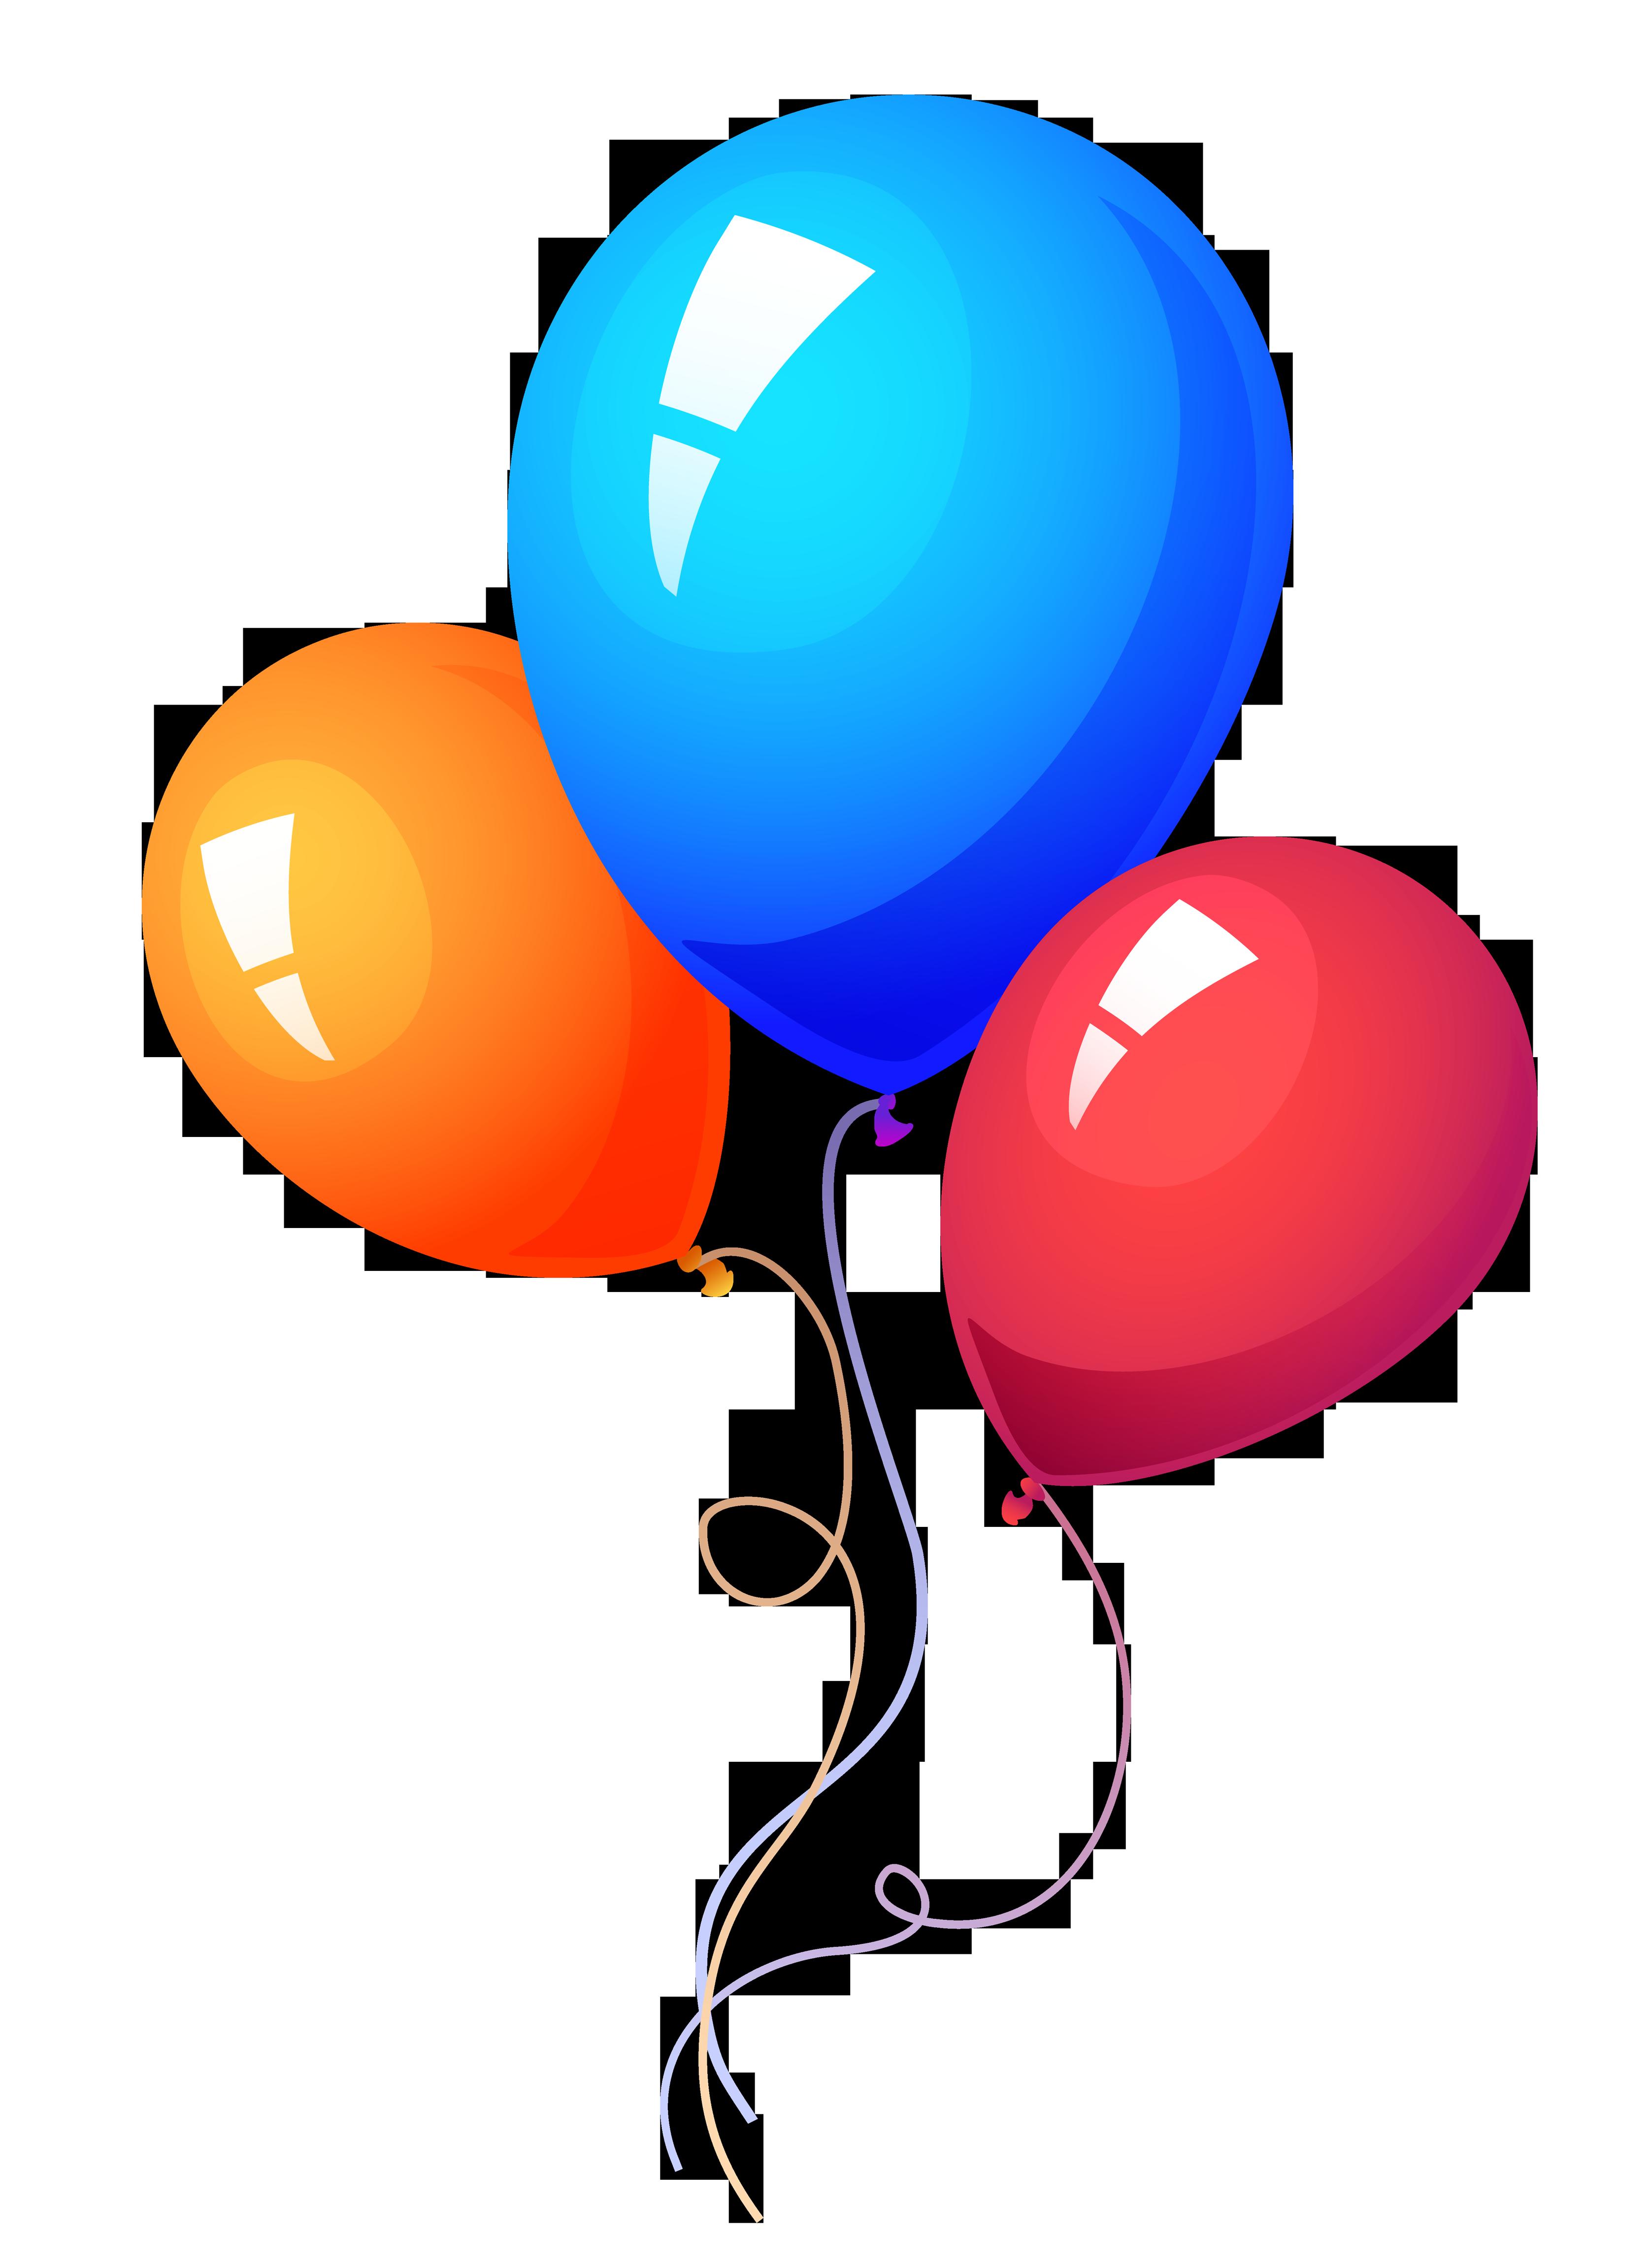 Balloon PNG - 1929